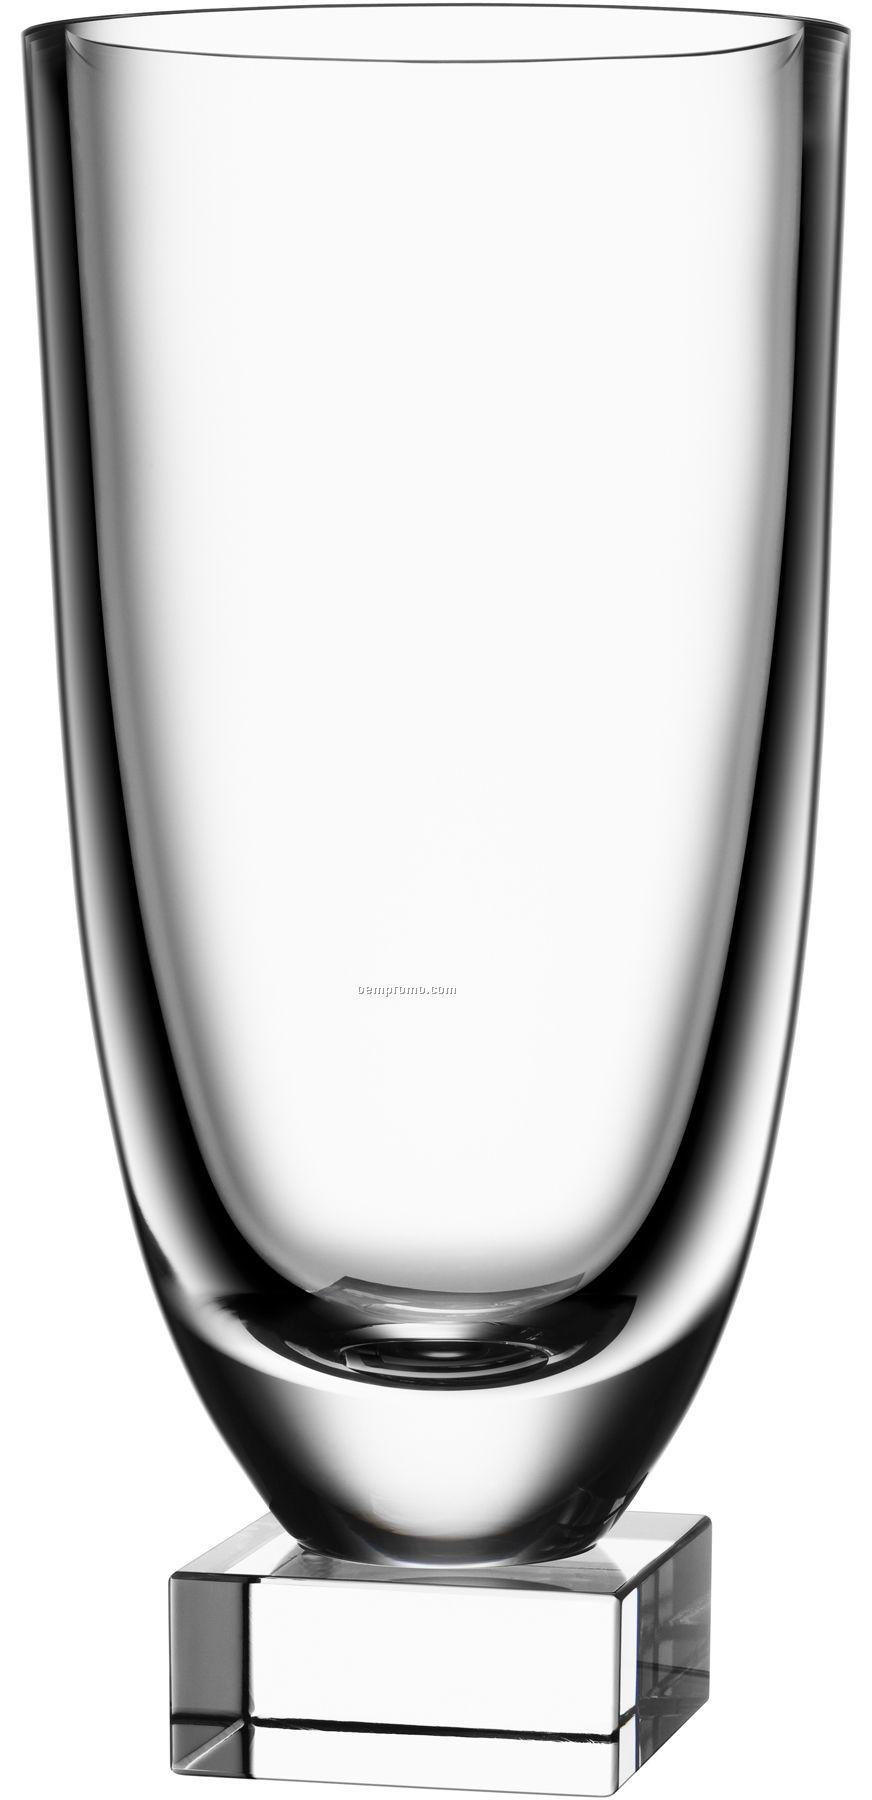 Beyond Crystal Vase W/ Square Base By Efva Attling